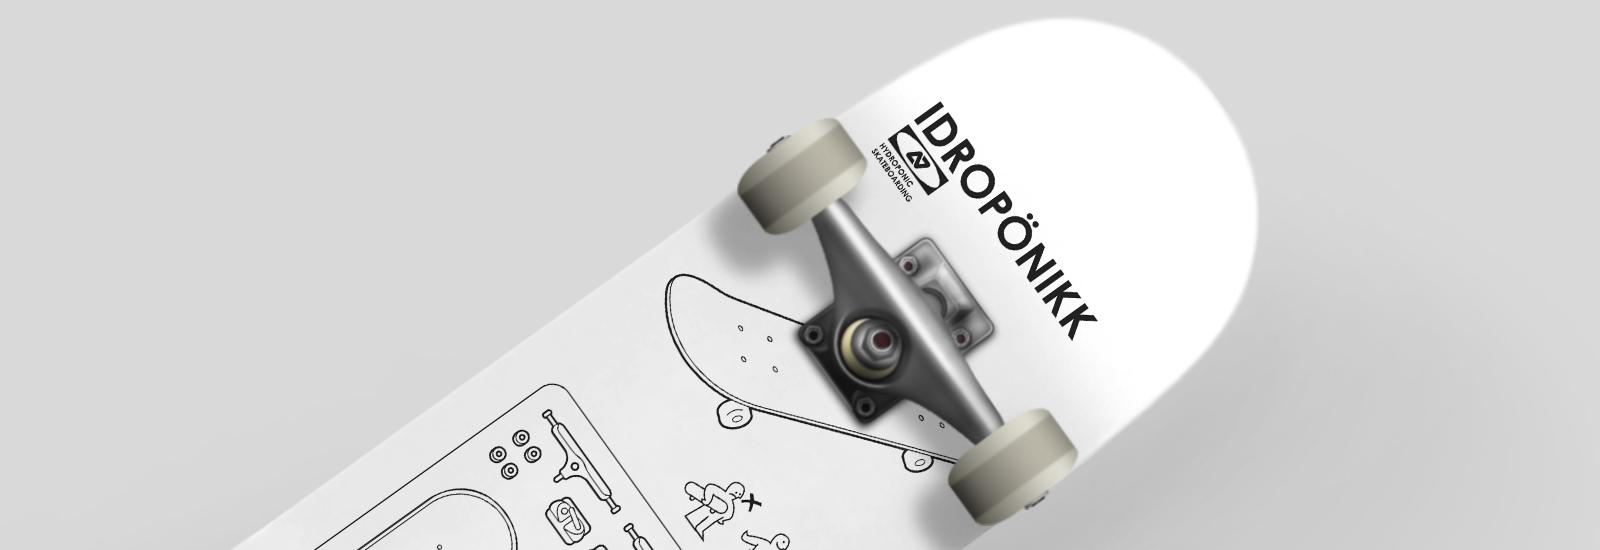 Skates Completos - Hydroponic